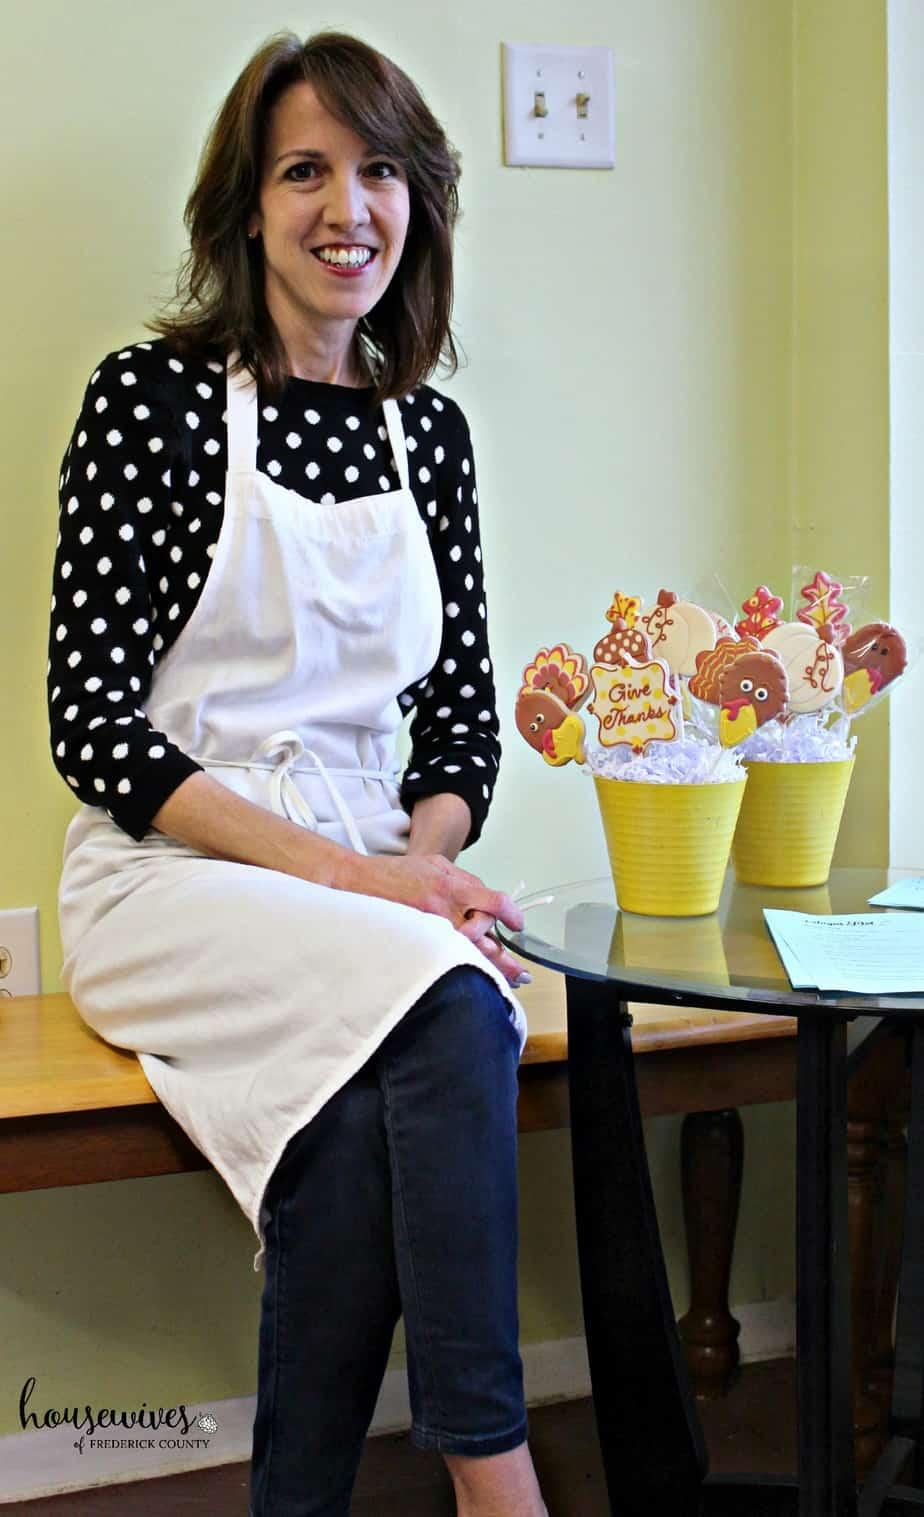 Decorating Sugar Cookies with Sugar Dot Cookies